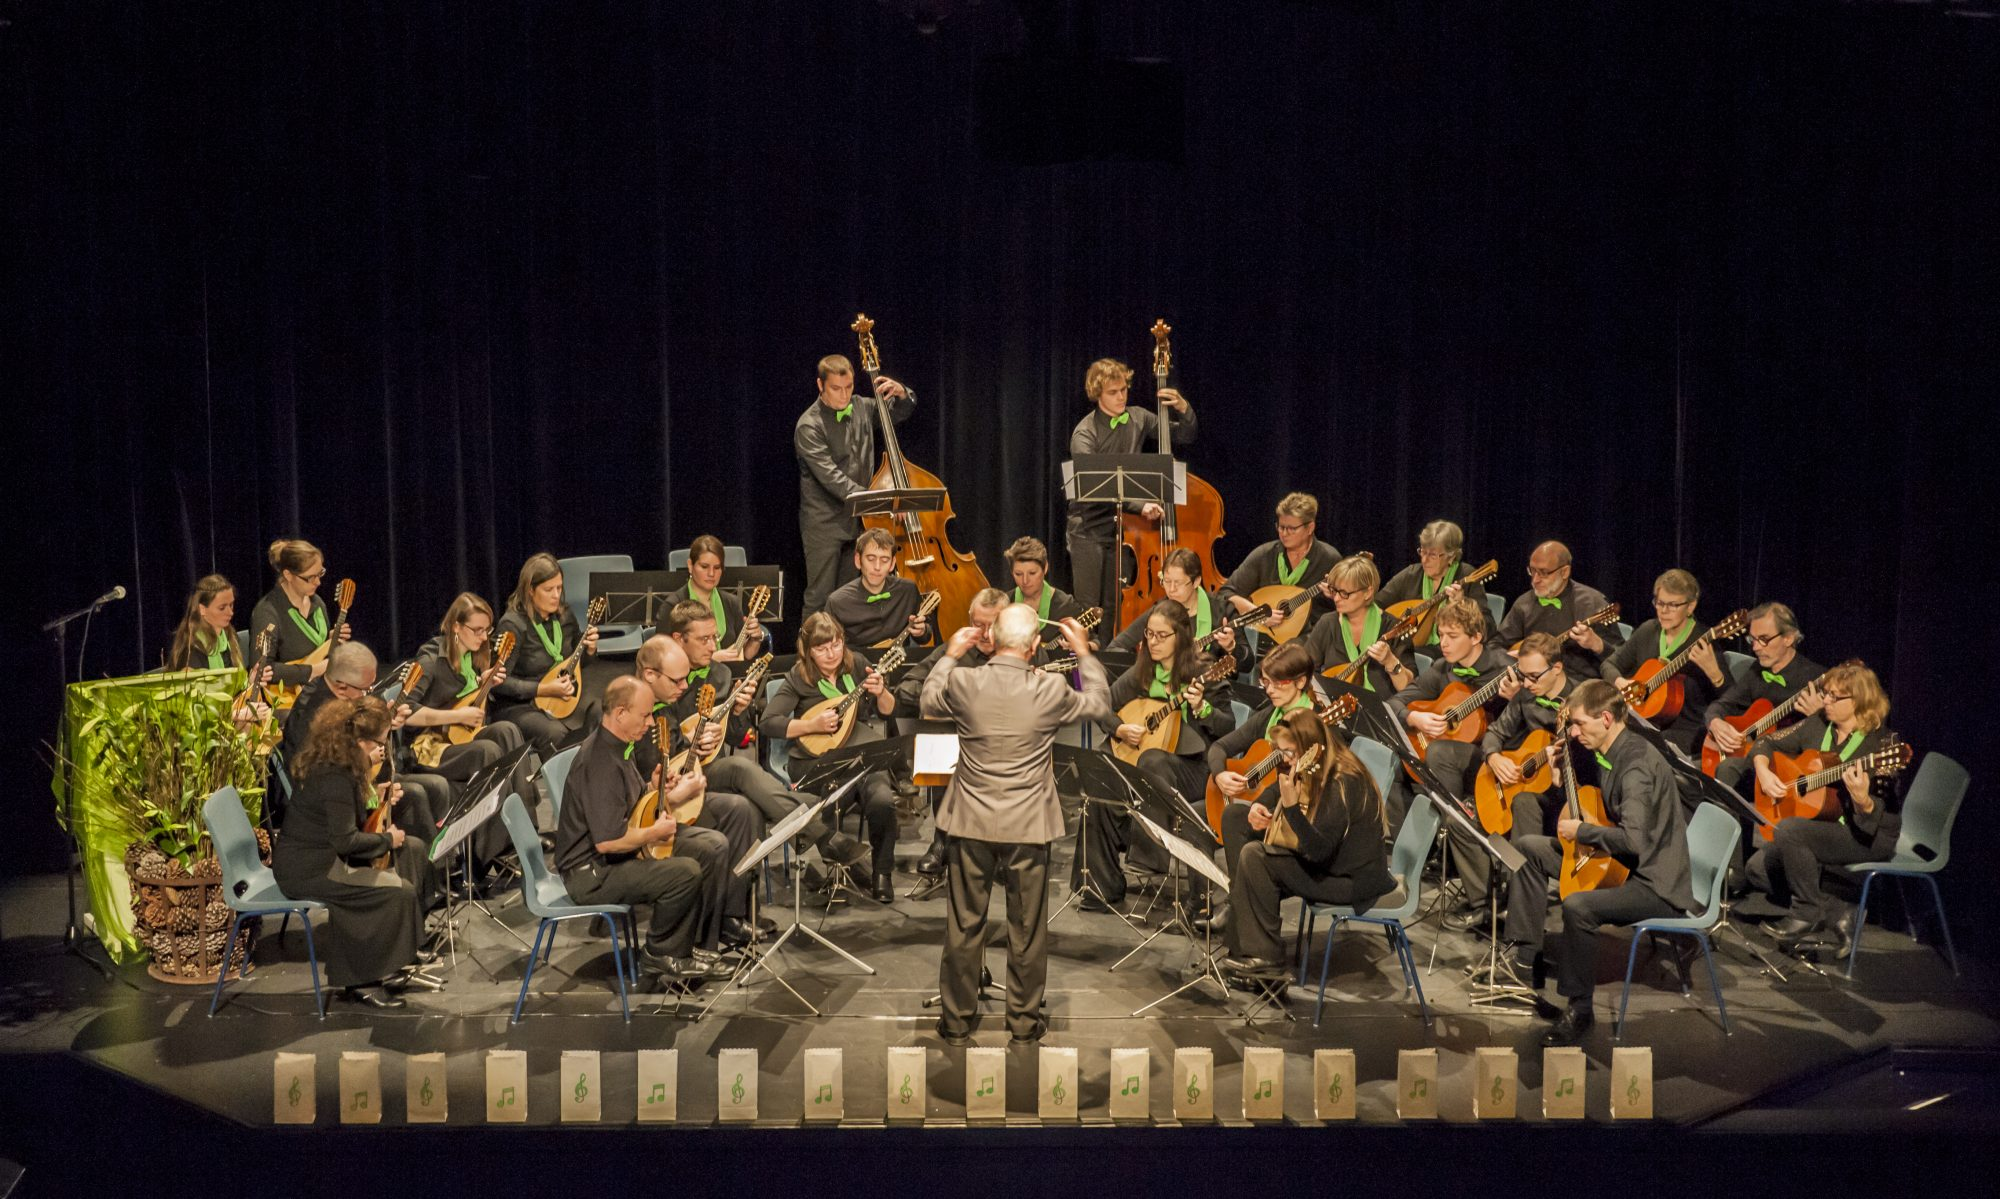 Brasschaats Mandoline-Orkest